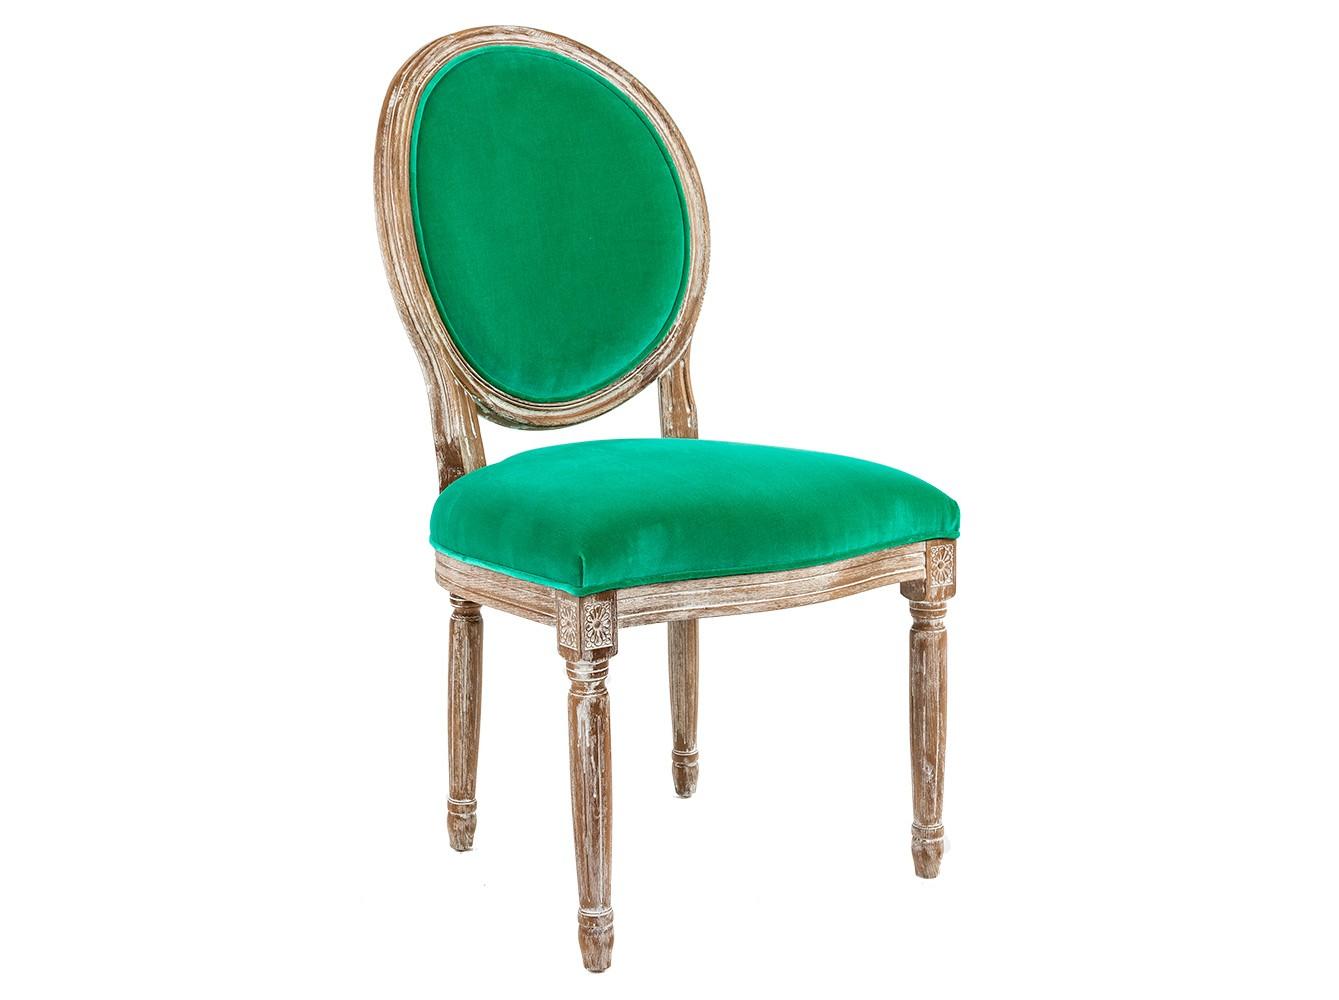 Кухонный стул Object Desire 15438304 от thefurnish